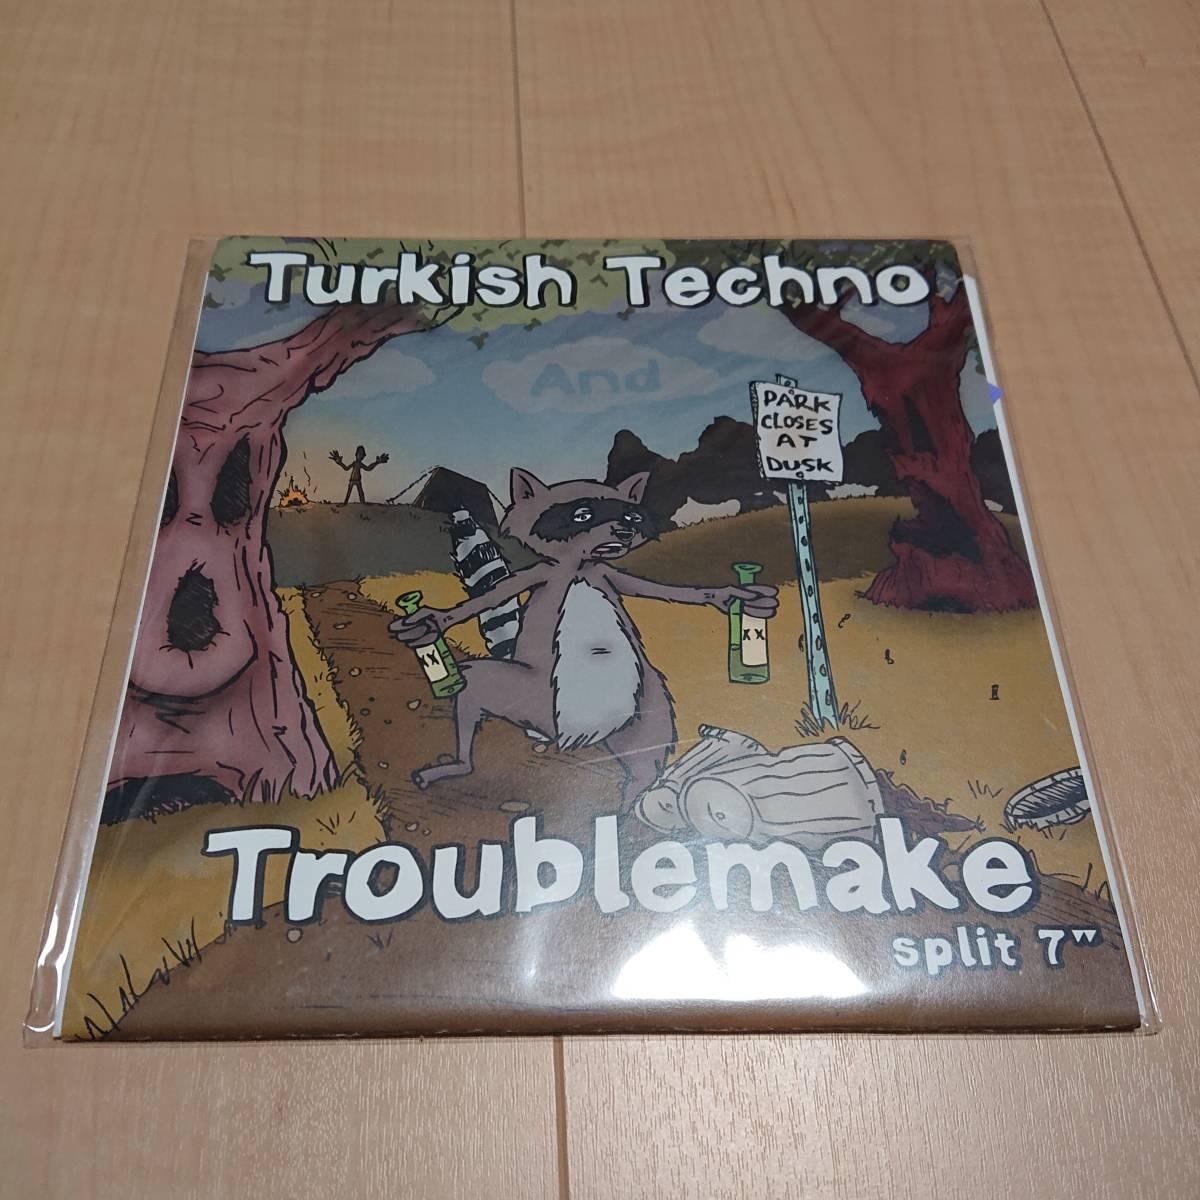 【Turkish Techno - Troublemake】dillinger four jawbreaker ergs pop punk